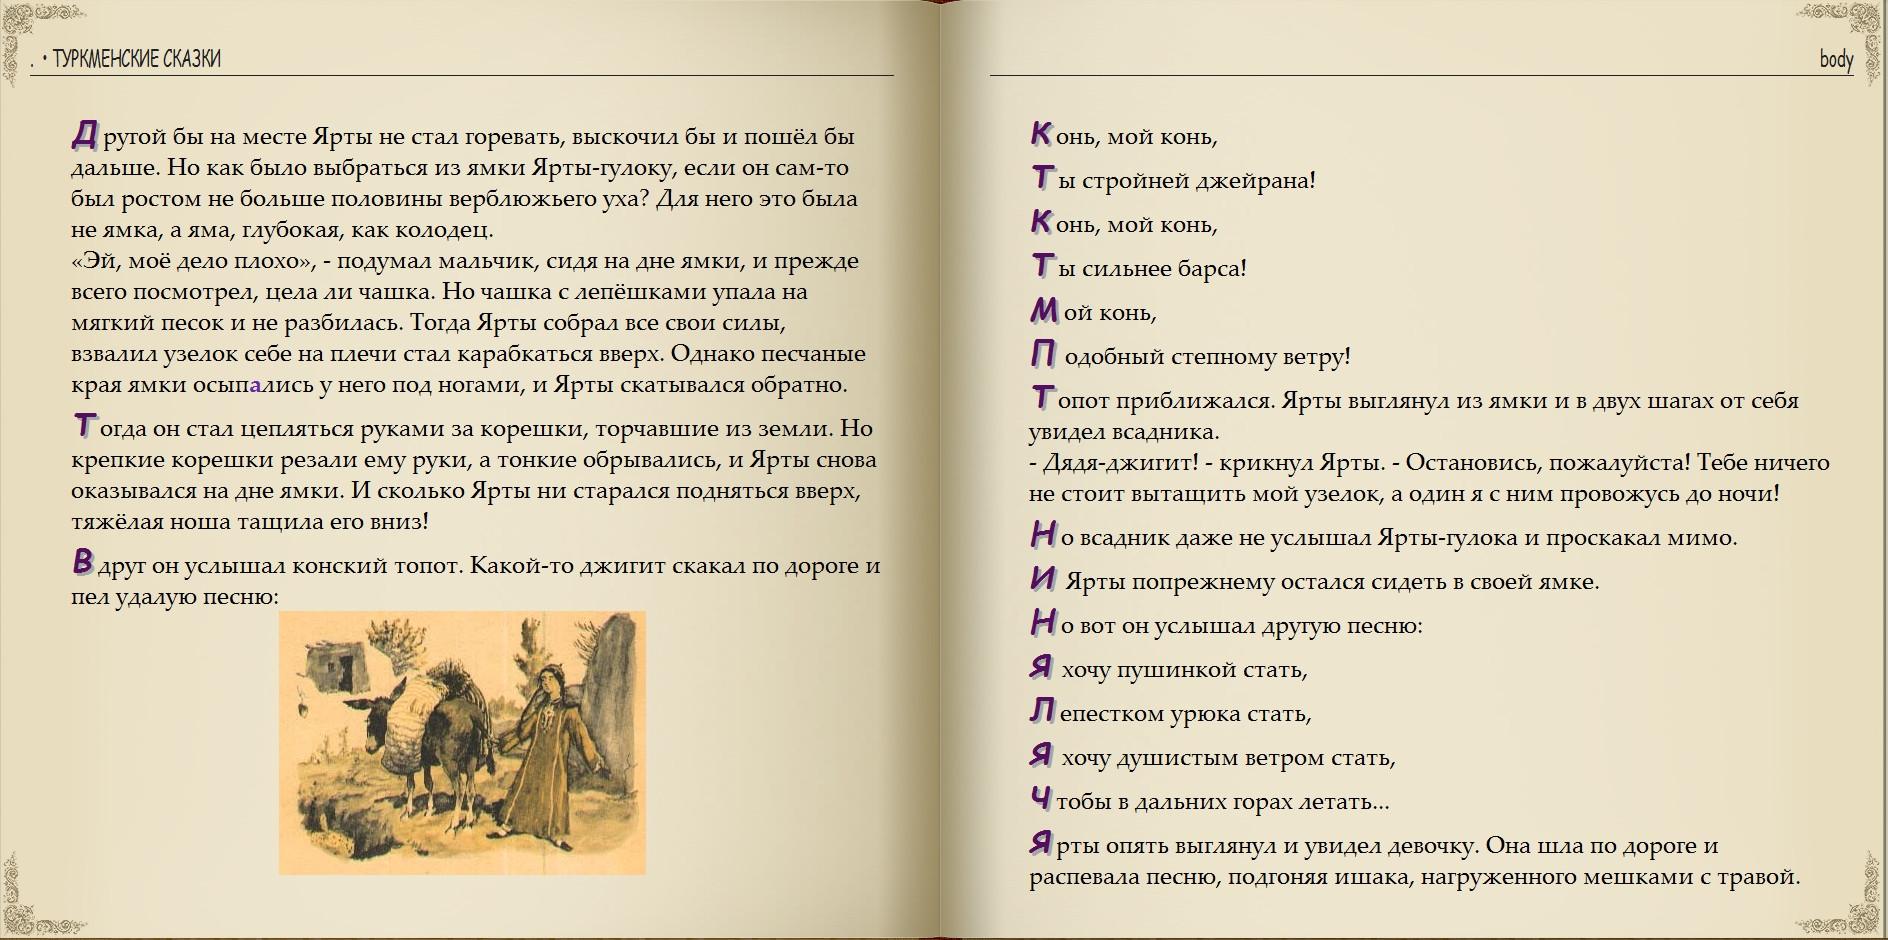 http://i5.imageban.ru/out/2015/03/11/cec73ace93ea603b7fa7c5b7790389e9.jpg